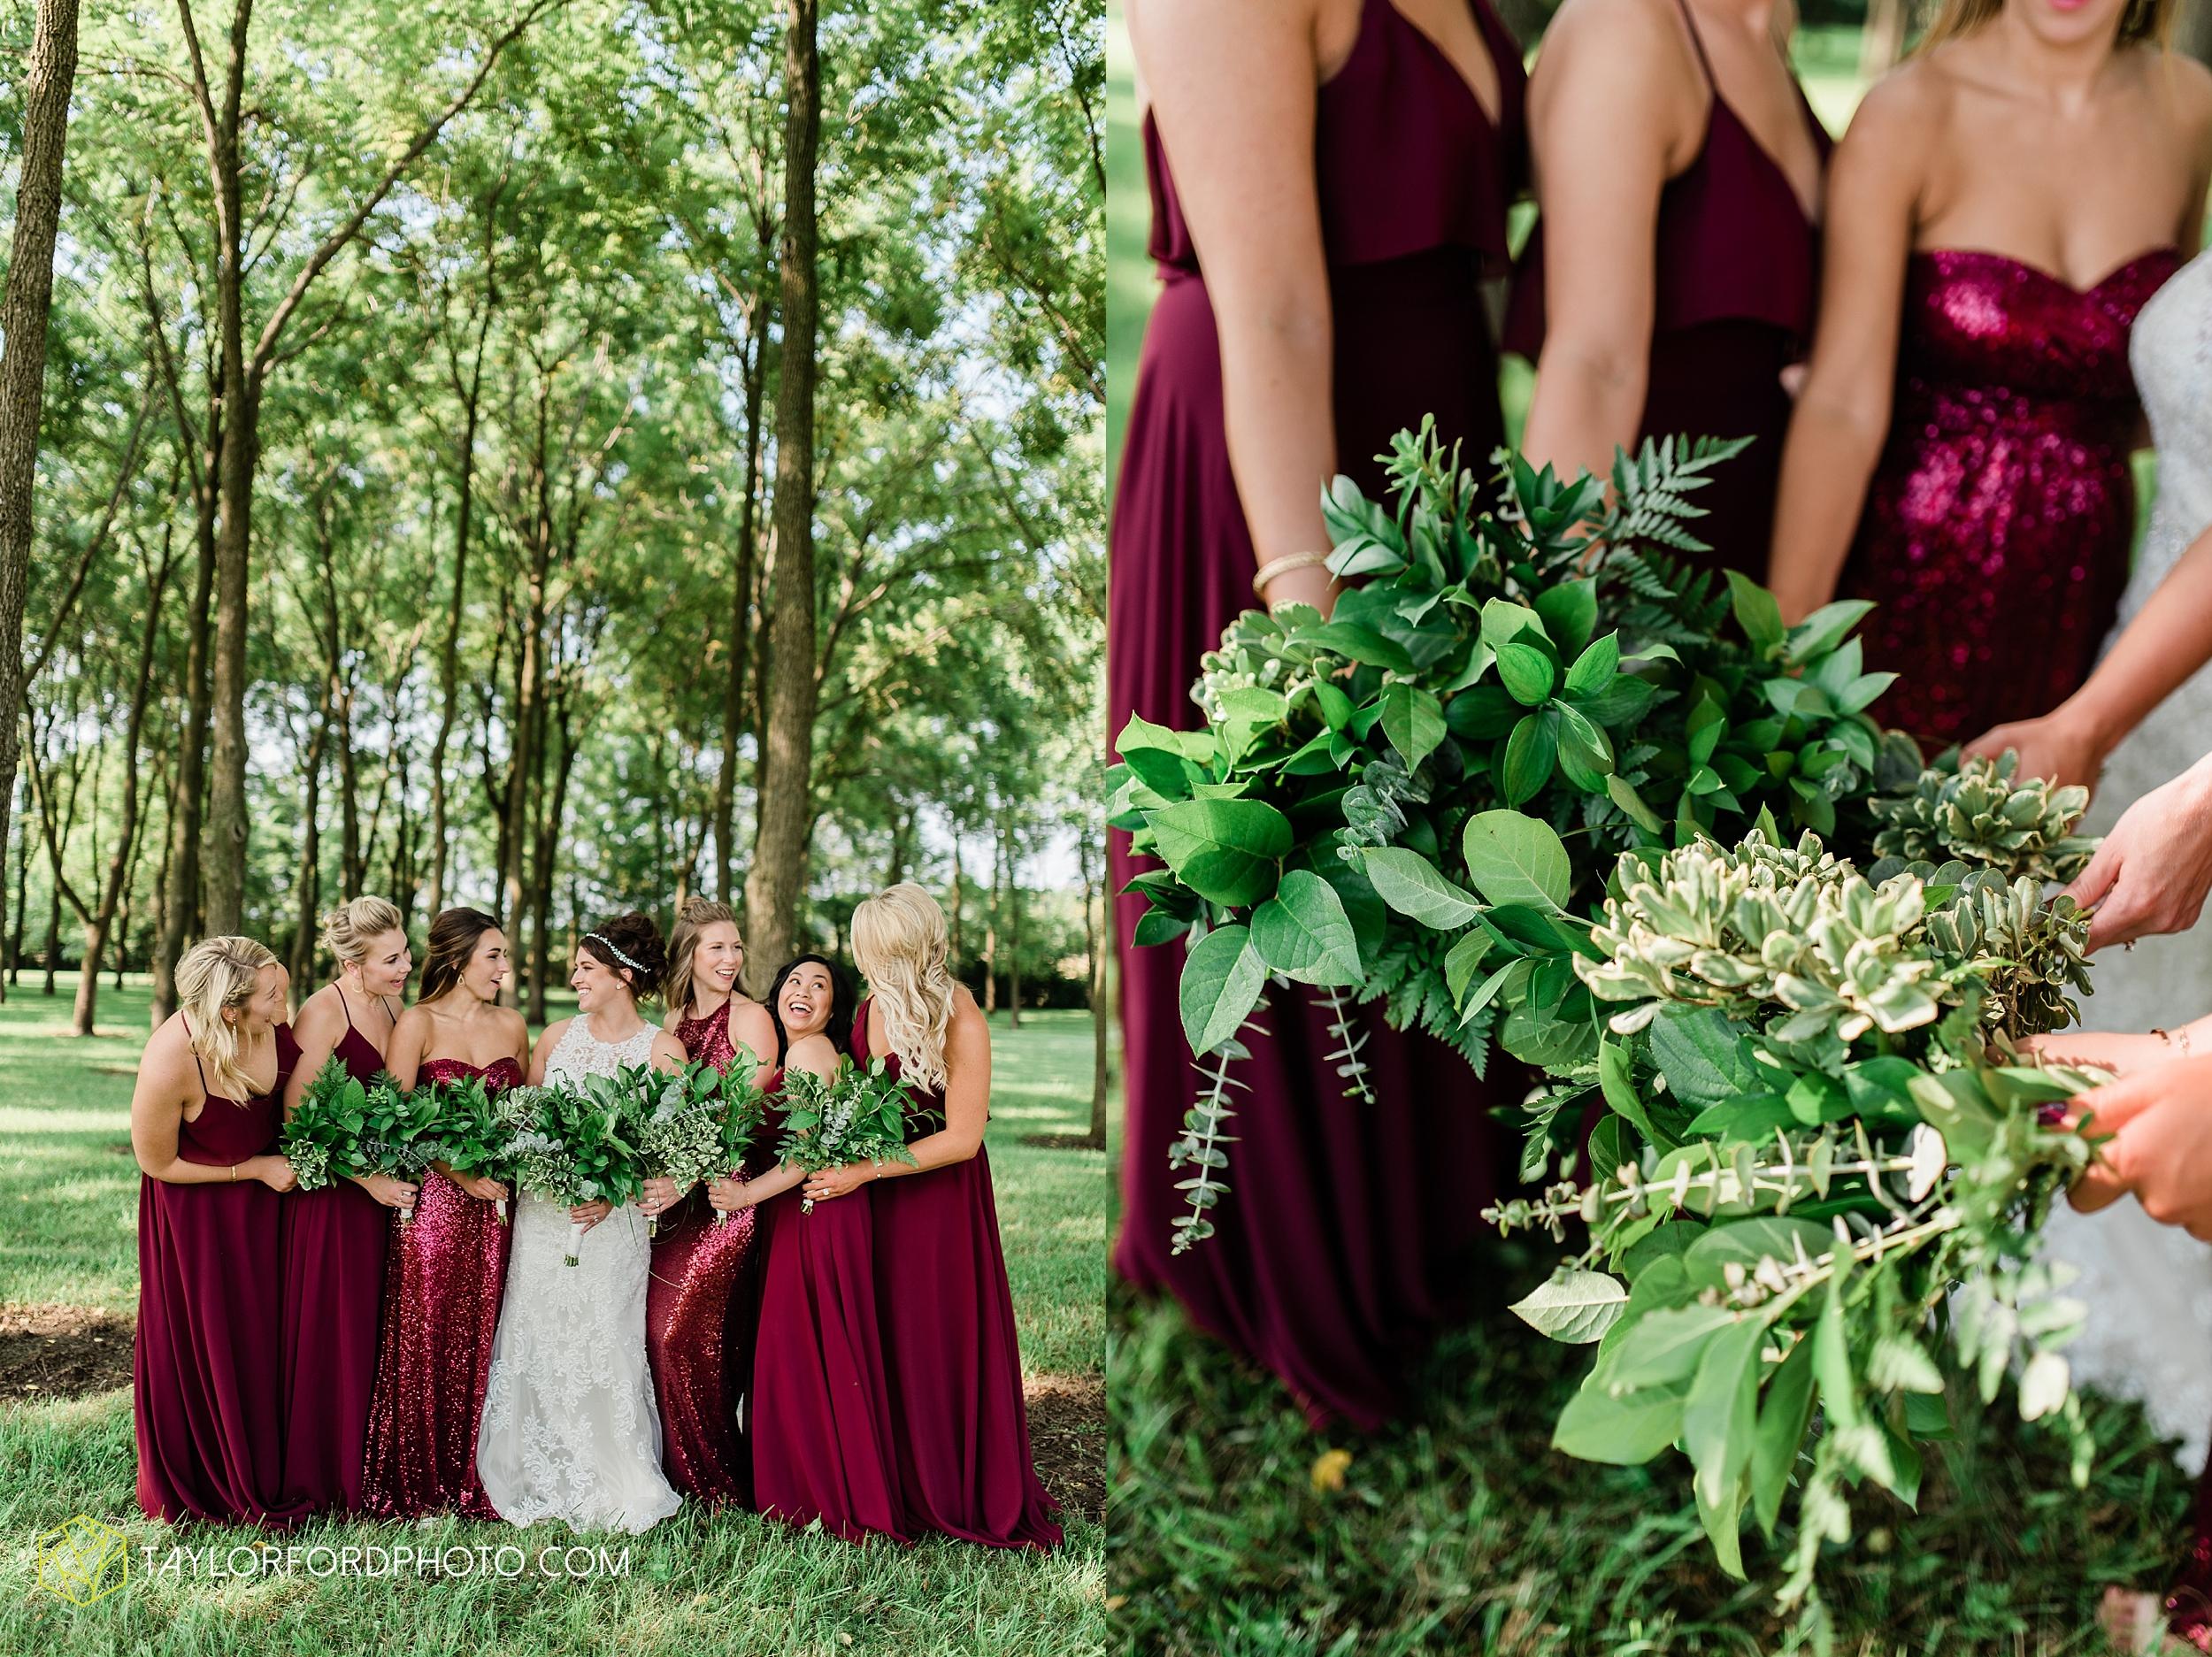 van-wert-ohio-first-united-methodist-church-county-dairy-barn-wedding-photographer-taylor-ford-photography_9846.jpg